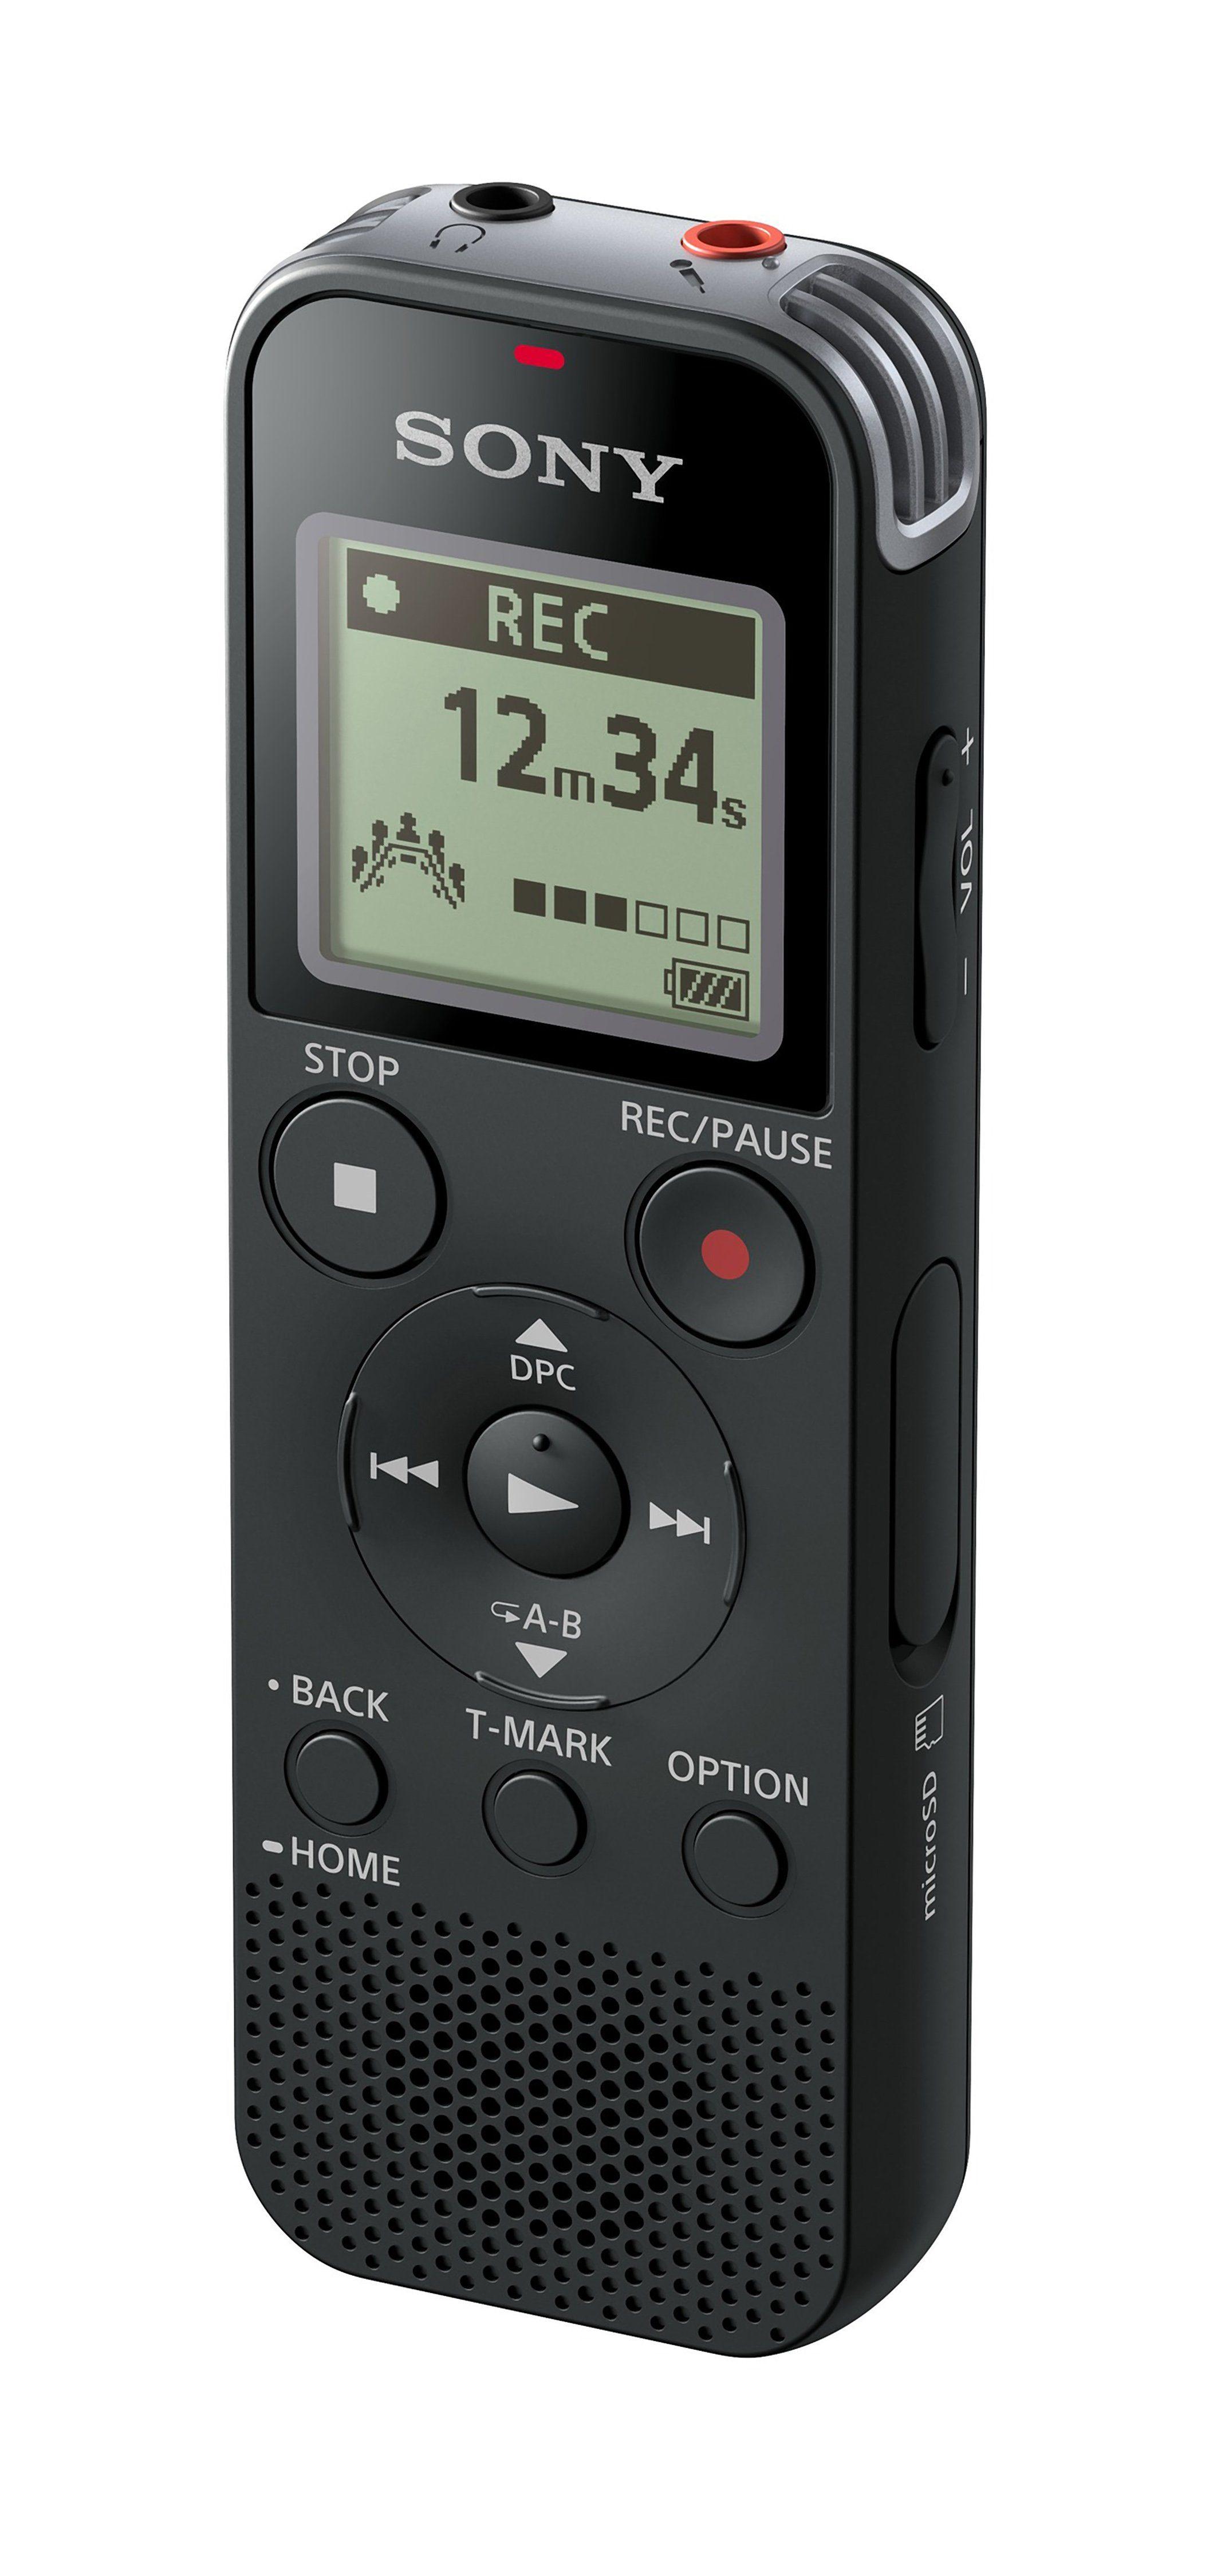 Sony Digitaler Voice Recorder mit USB-Anschluss »ICD-PX470«